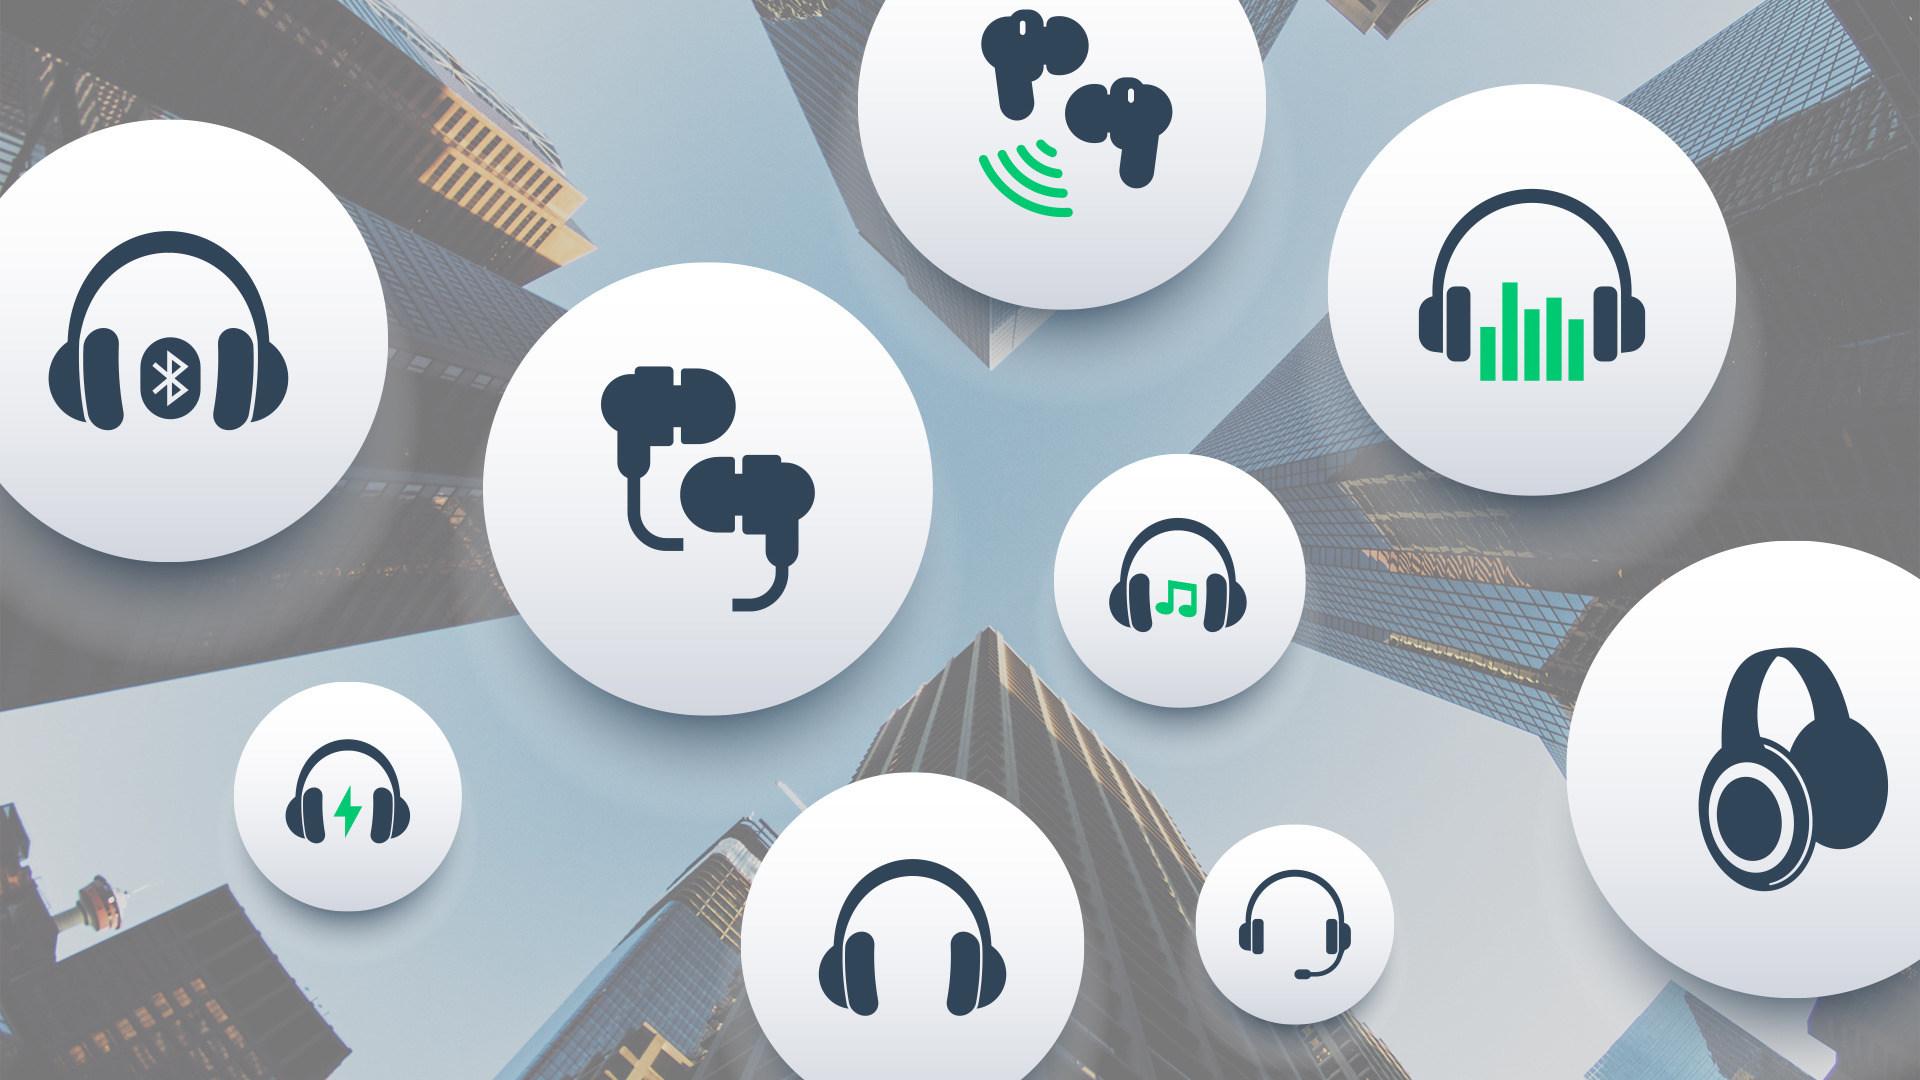 Headset, Kopfhörer, Bluetooth, Drahtlos, Wireless, kabellos, Funk, Bluetooth-Kopfhörer, In-Ear-Kopfhörer, Network, Verbindung, Bluetooth 4.0, Bluetooth 5.0, Bluetooth Low Energy, Bluetooth Anmeldung, Connection, Pairing, Funkverbindung, Bluetooth Logo, Blauzahn, Bluetooth Verbindung